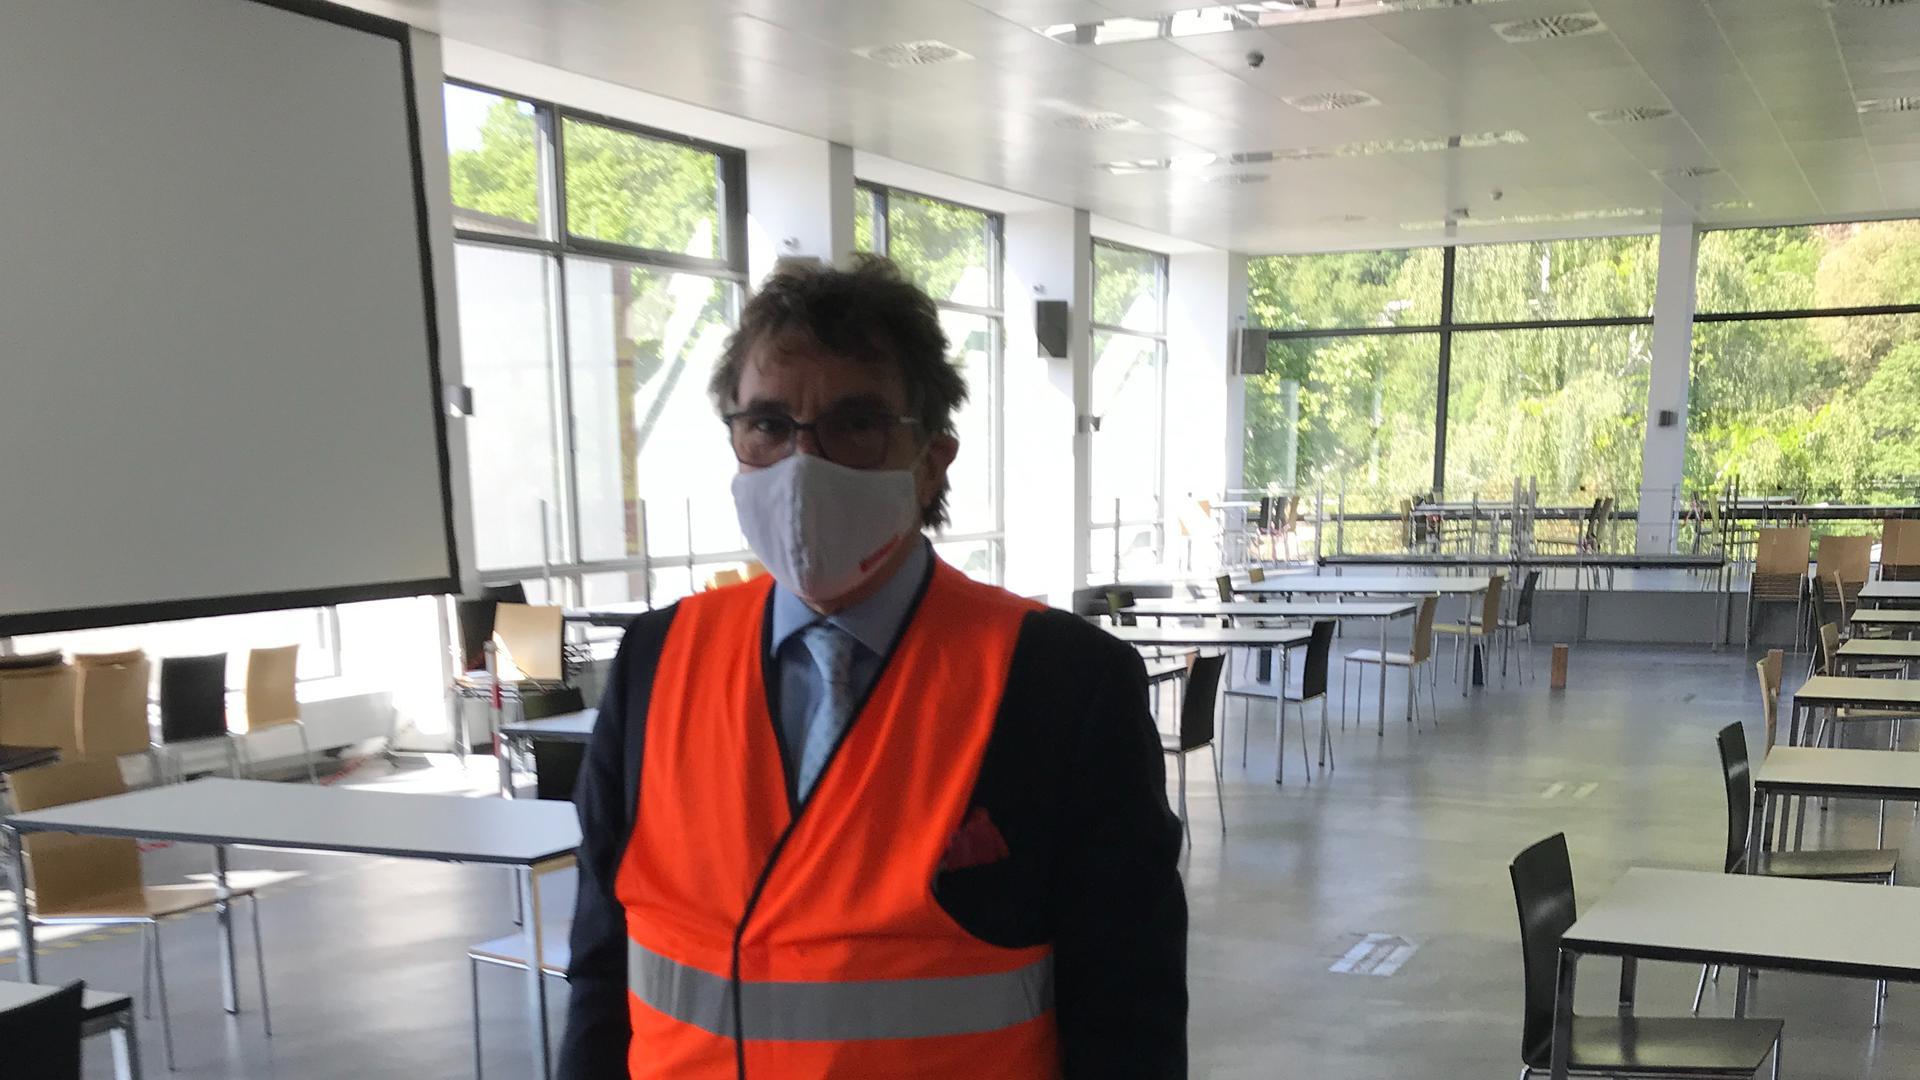 OB Christof Florus Corona Benz-Werk Gaggenau Besichtigung Mai 2020